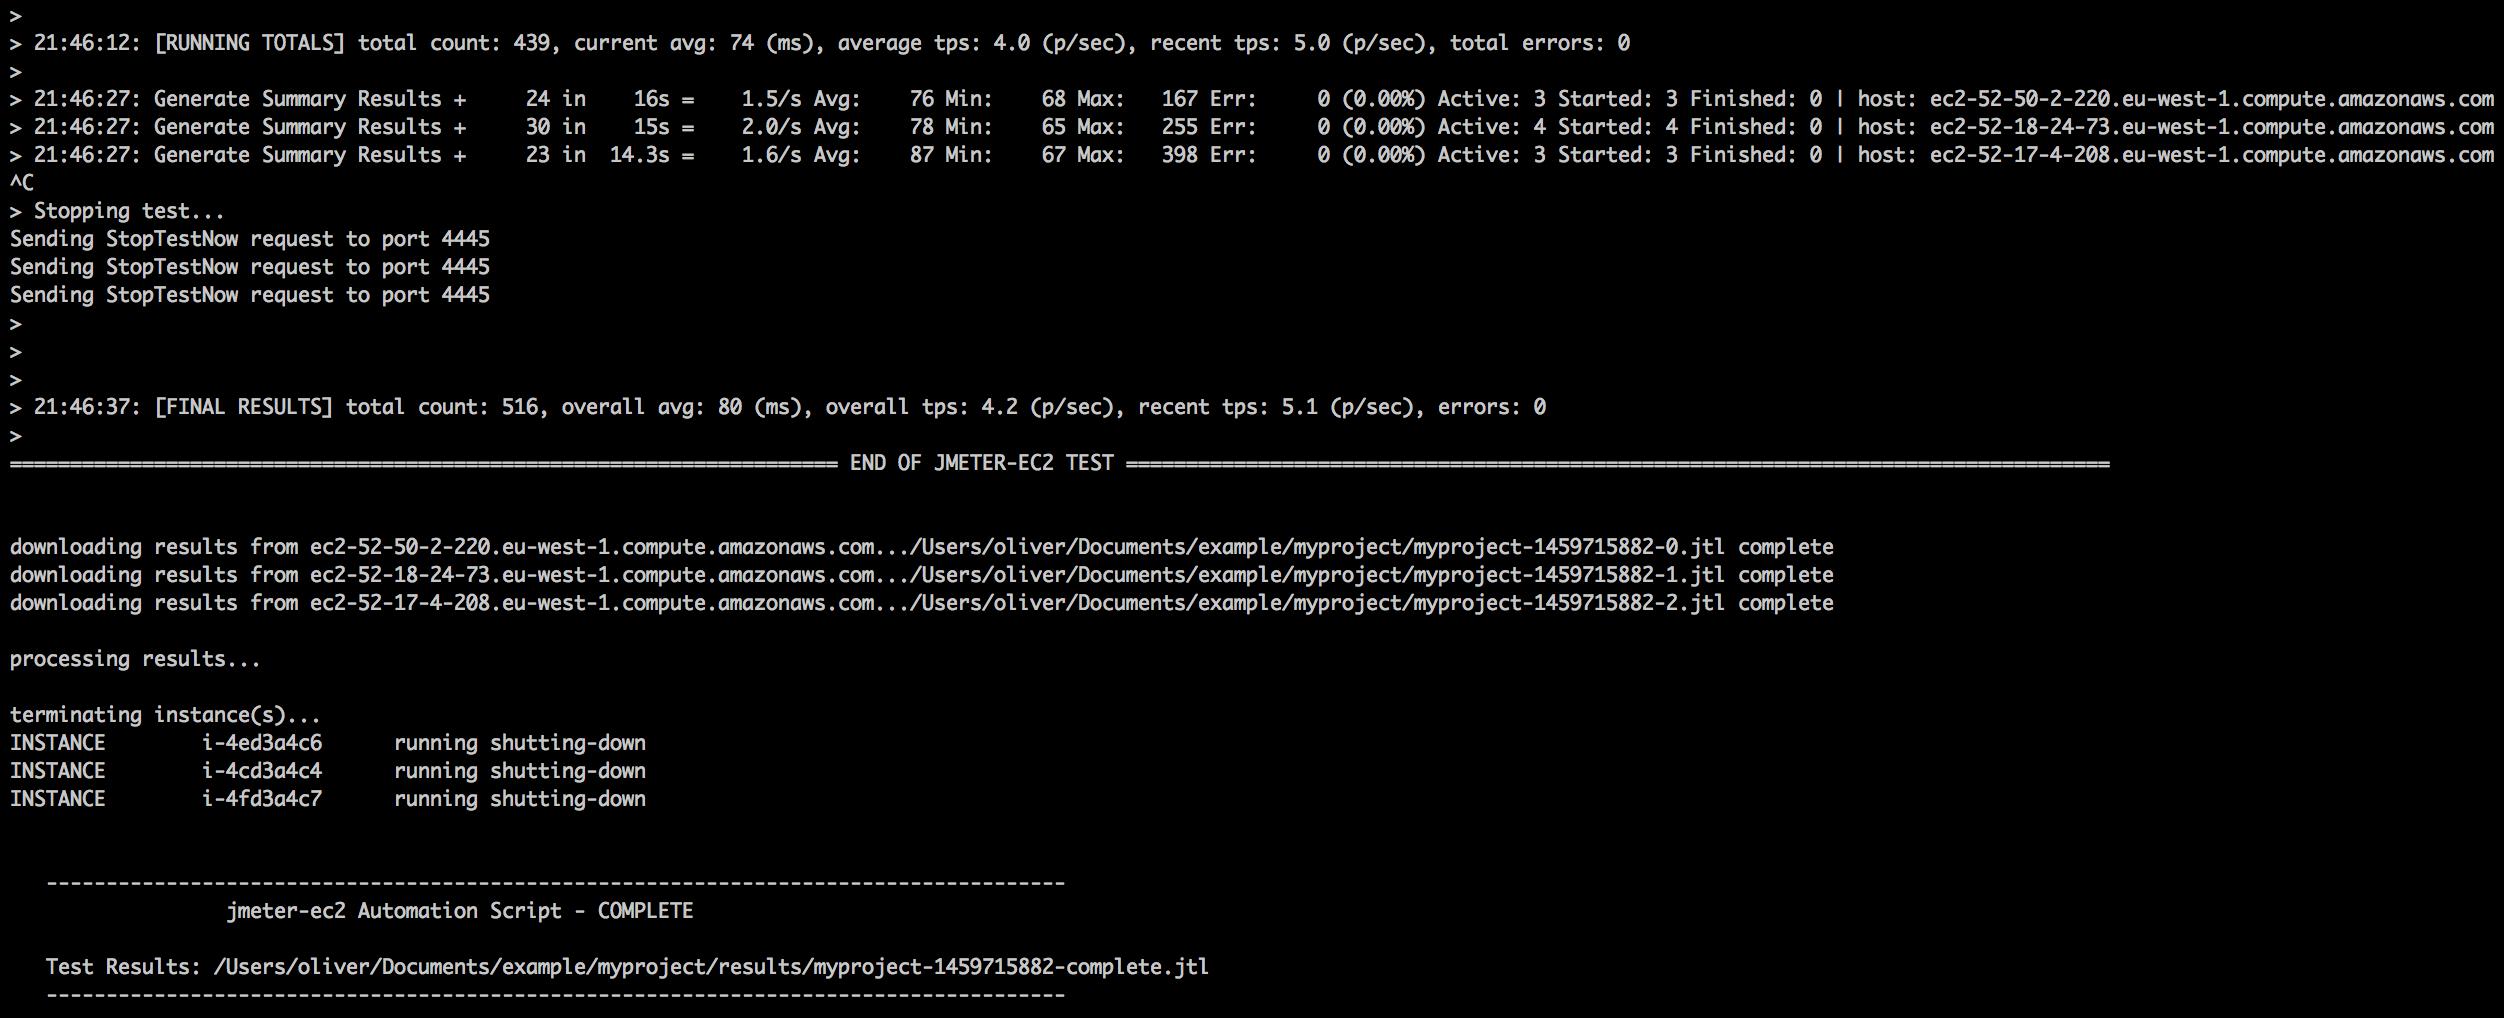 jmeter-ec2-screenshot-2